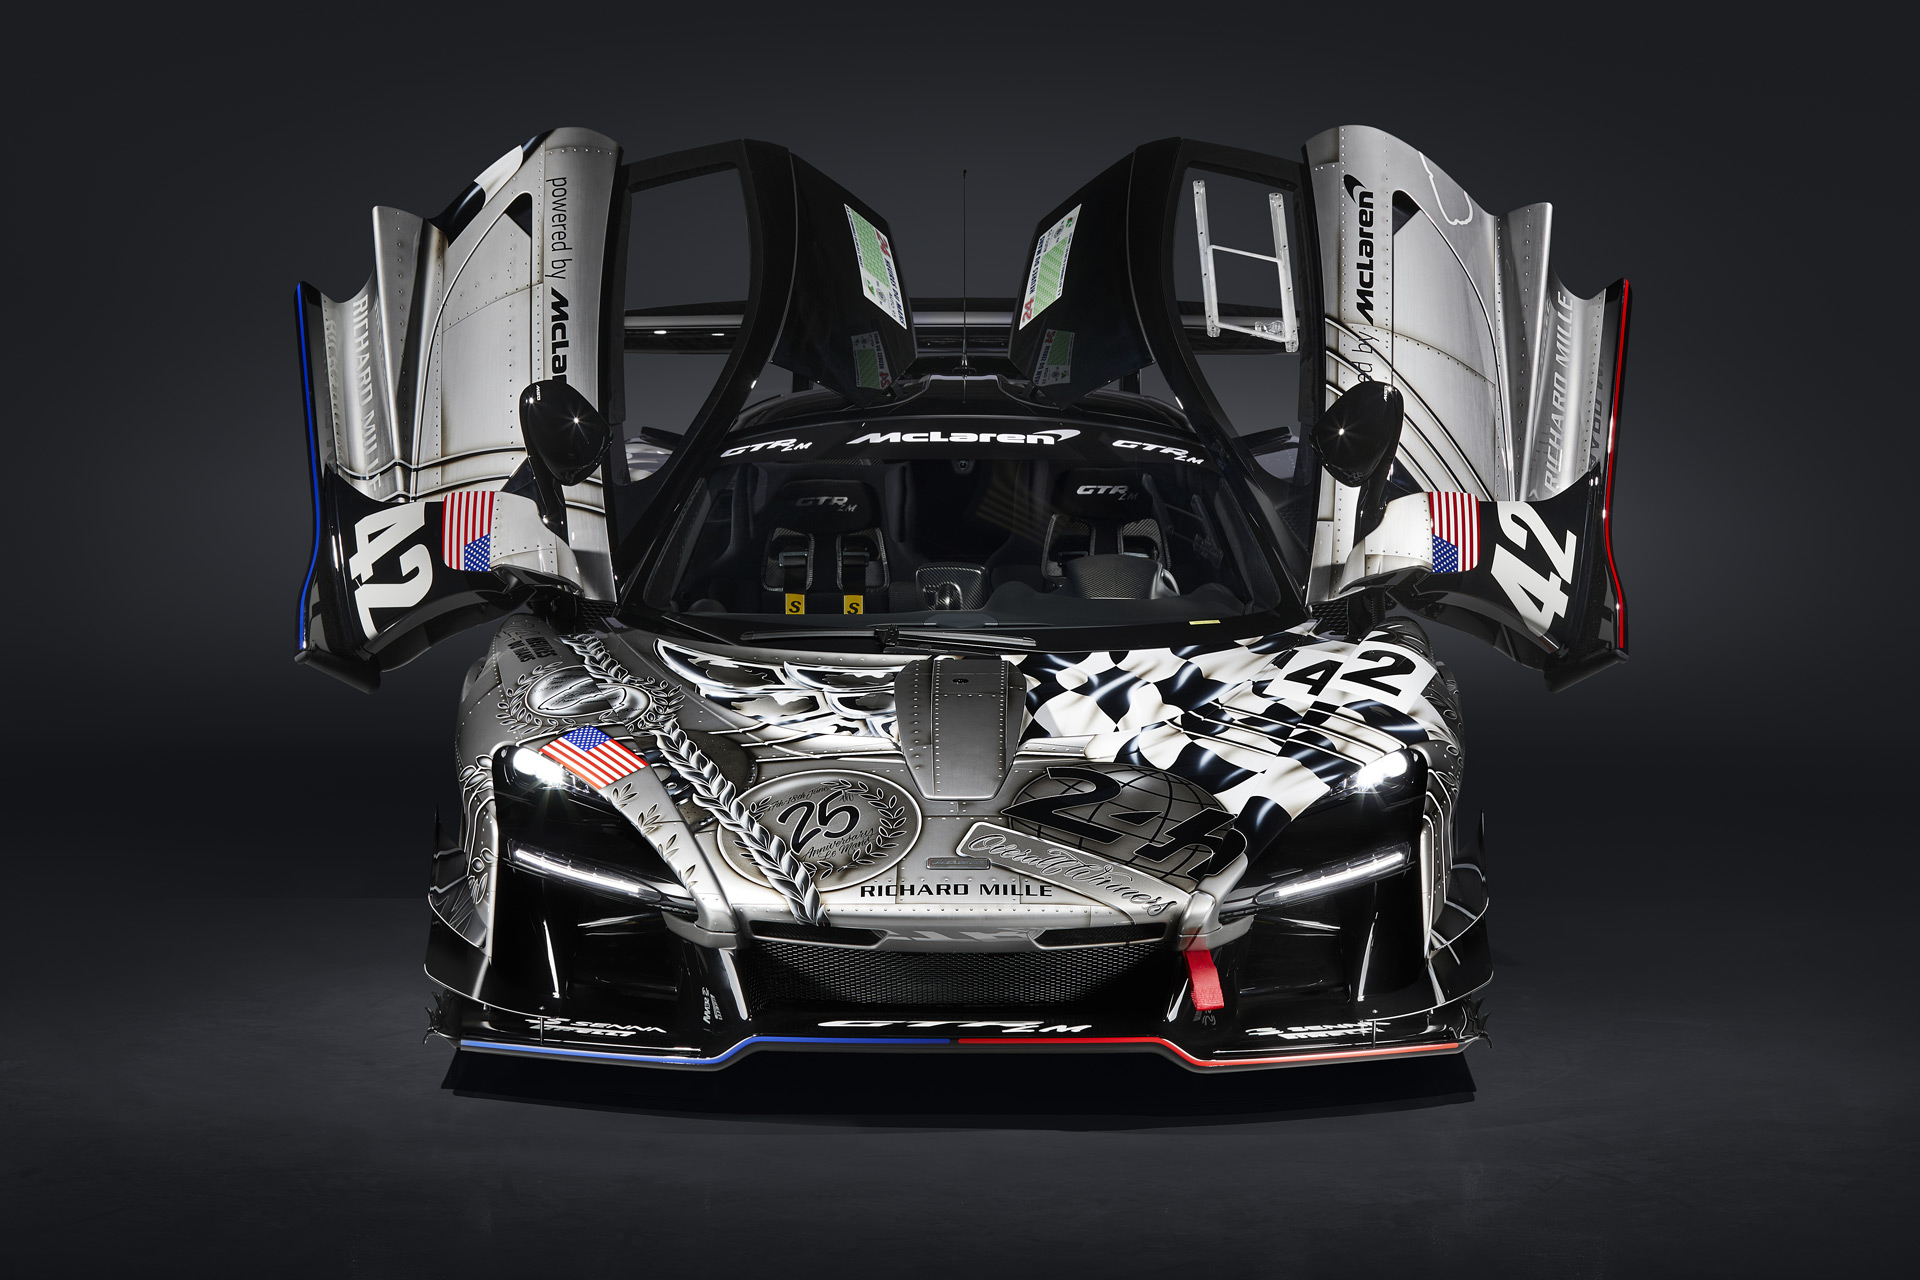 2022 BMW 2-Series, 2020 Rolls-Royce Dawn, McLaren Senna GTR LM: Today's Car News